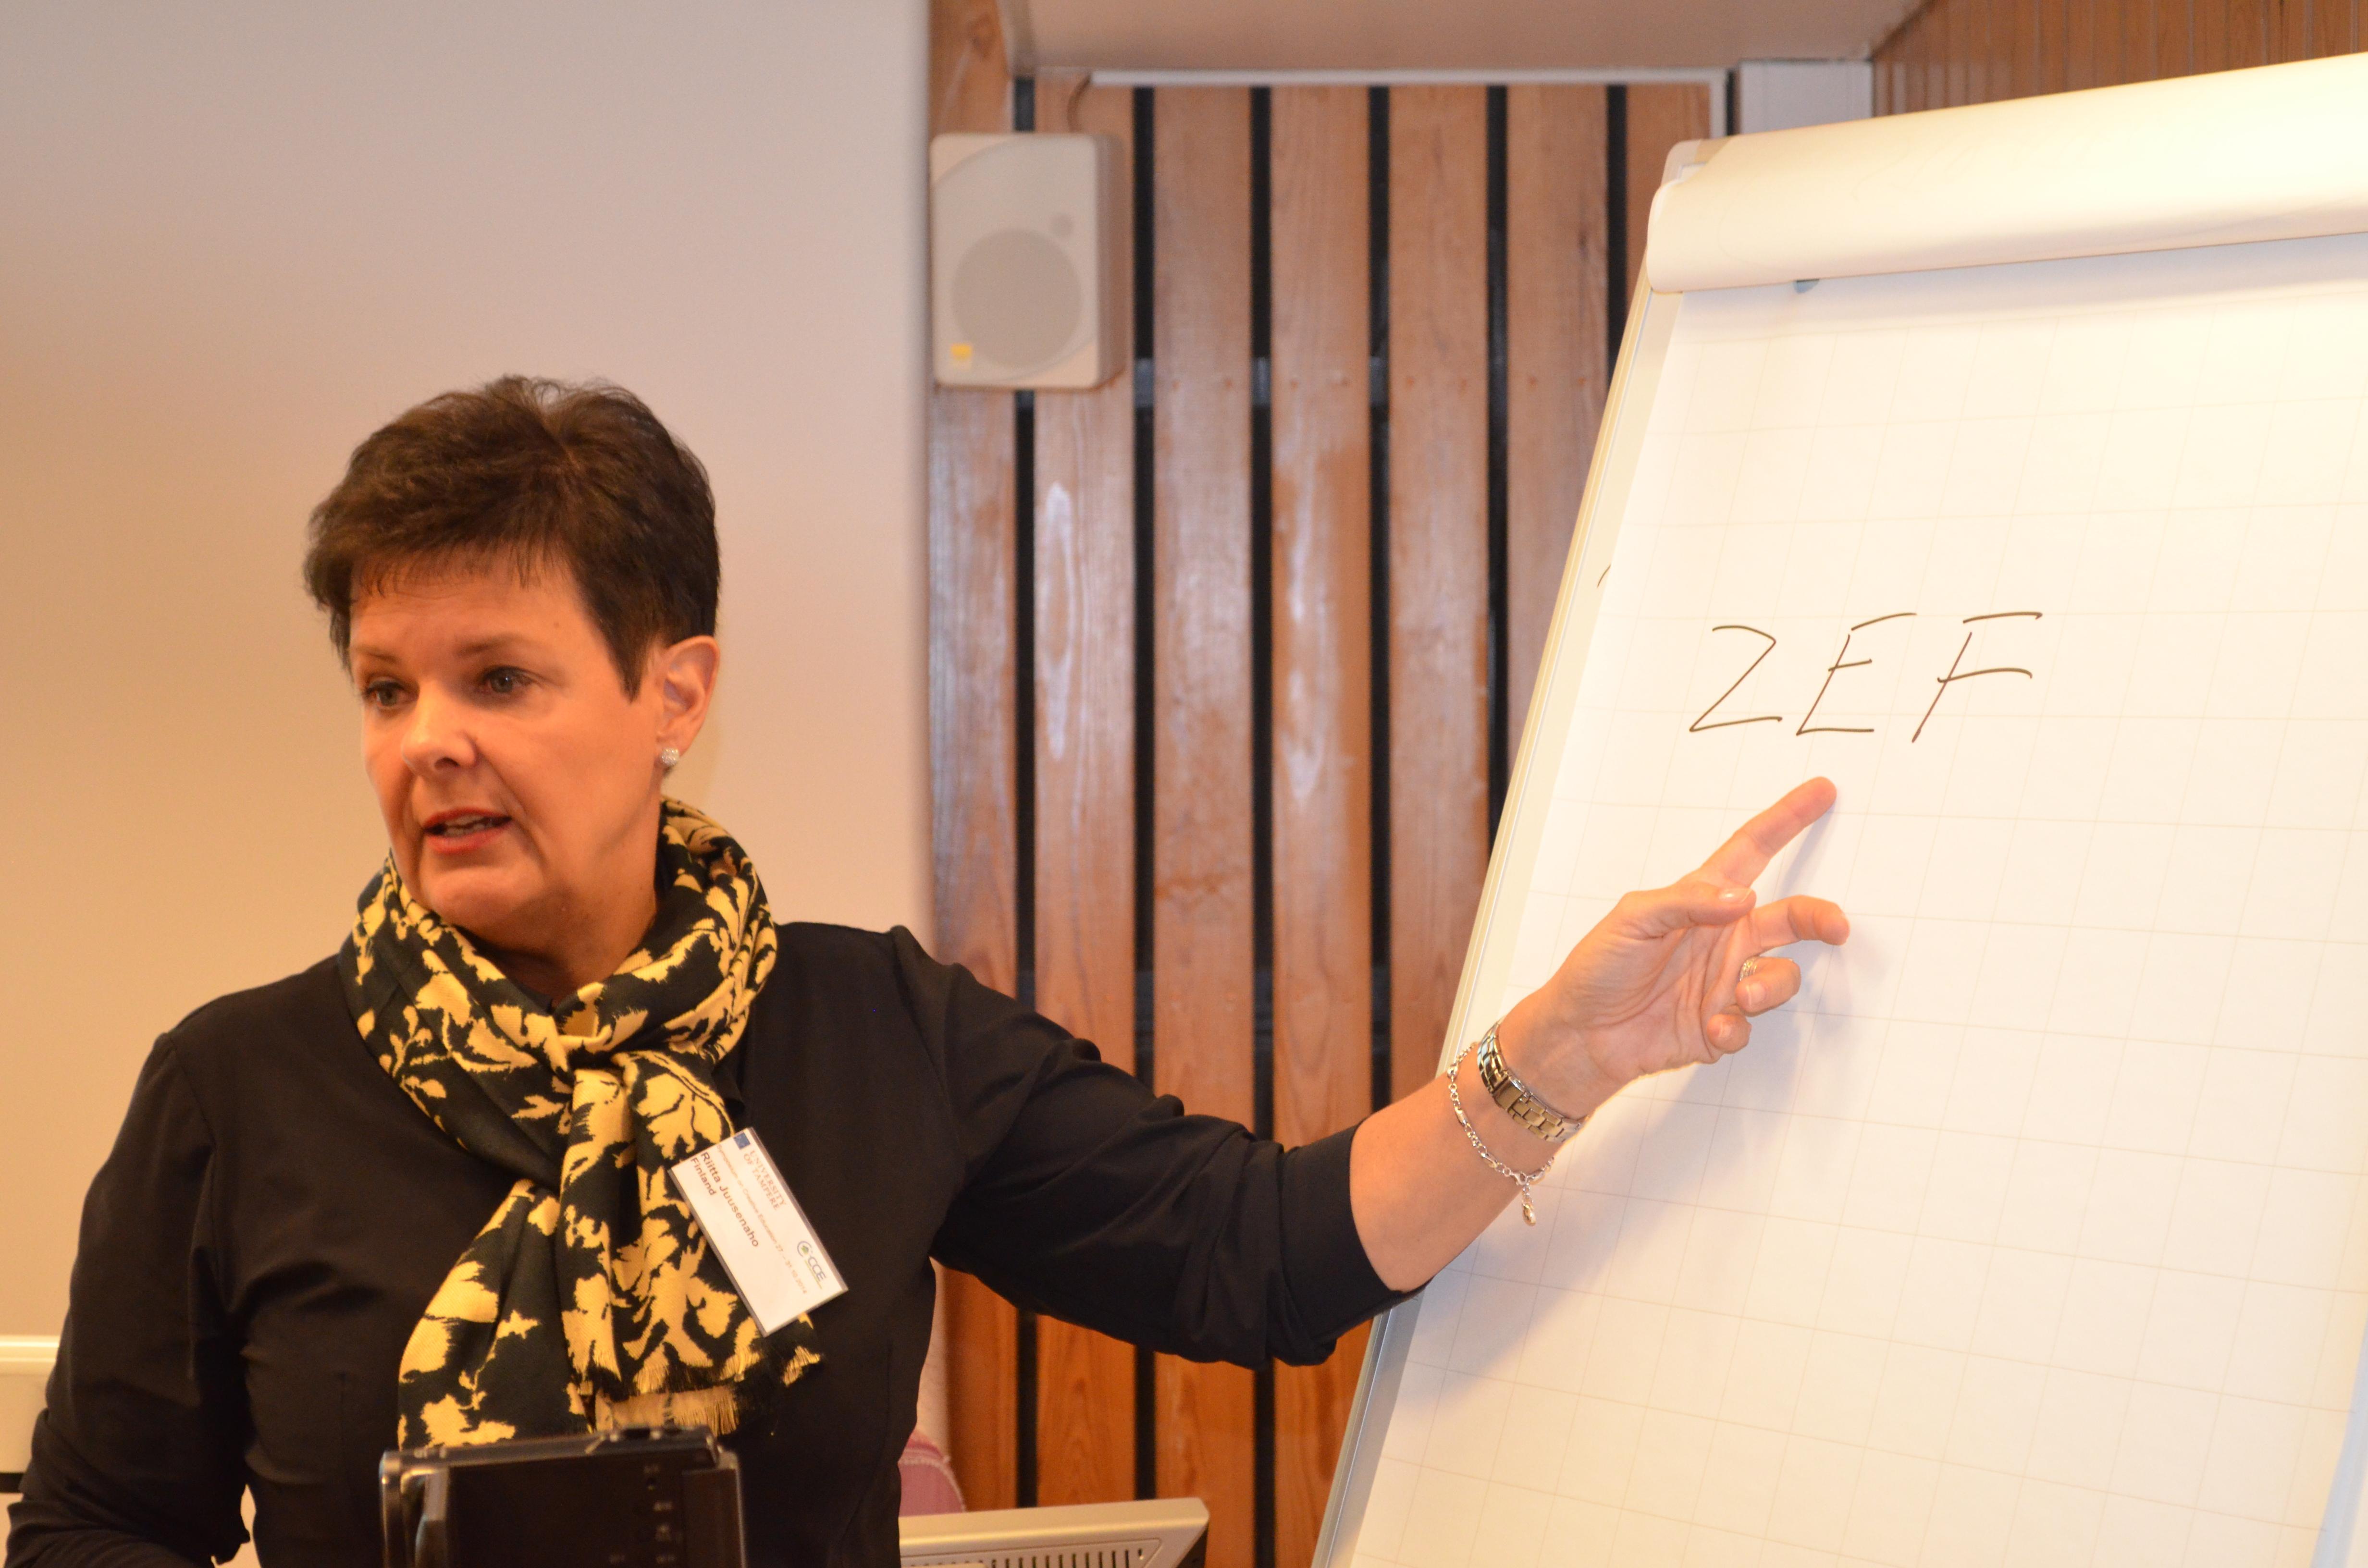 Dr. Riita on Finland Education